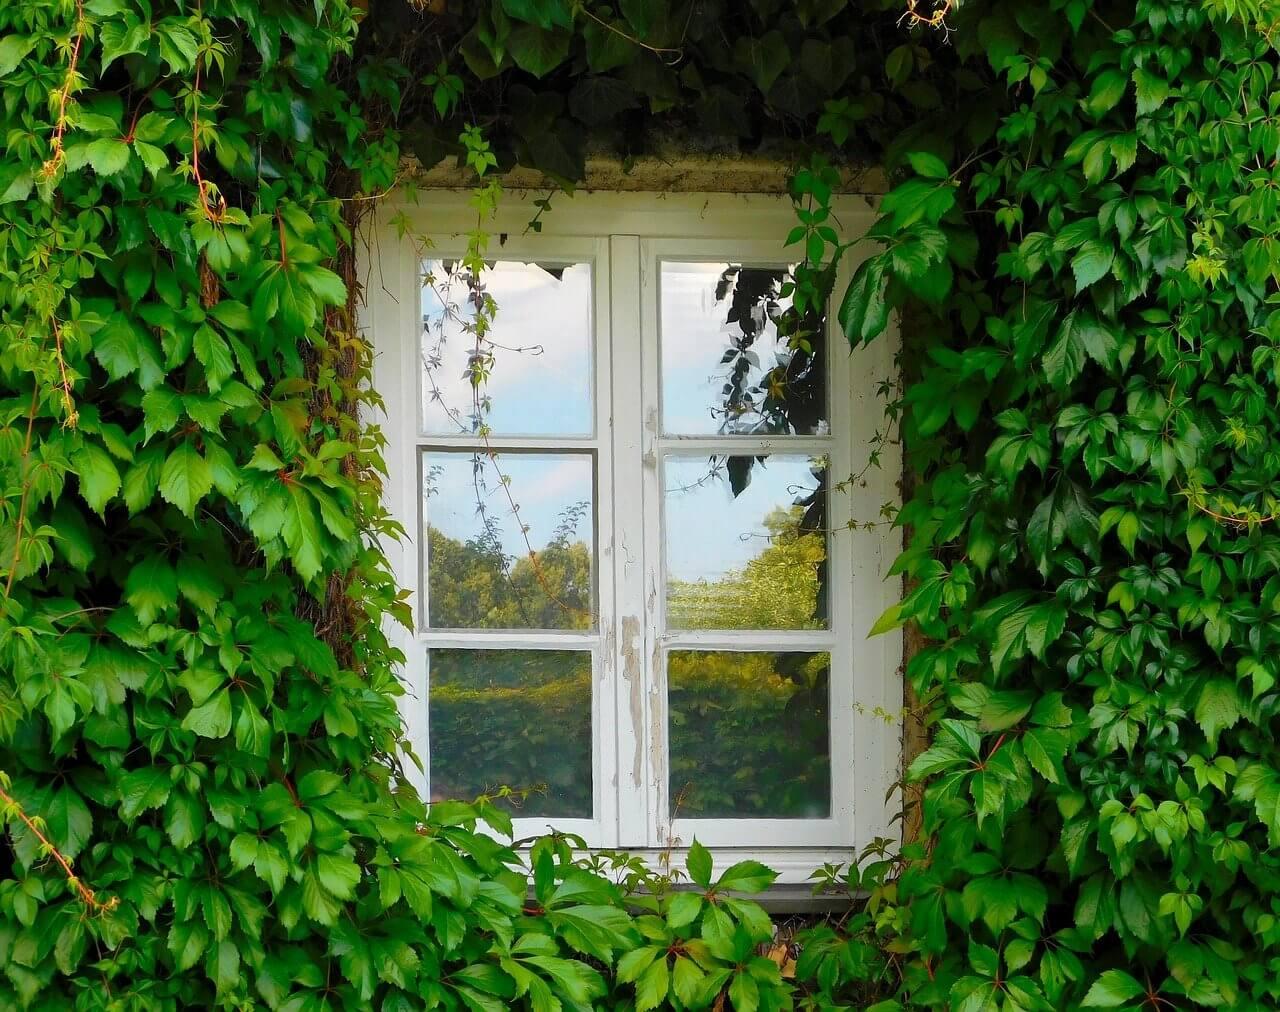 window-1679344_1280